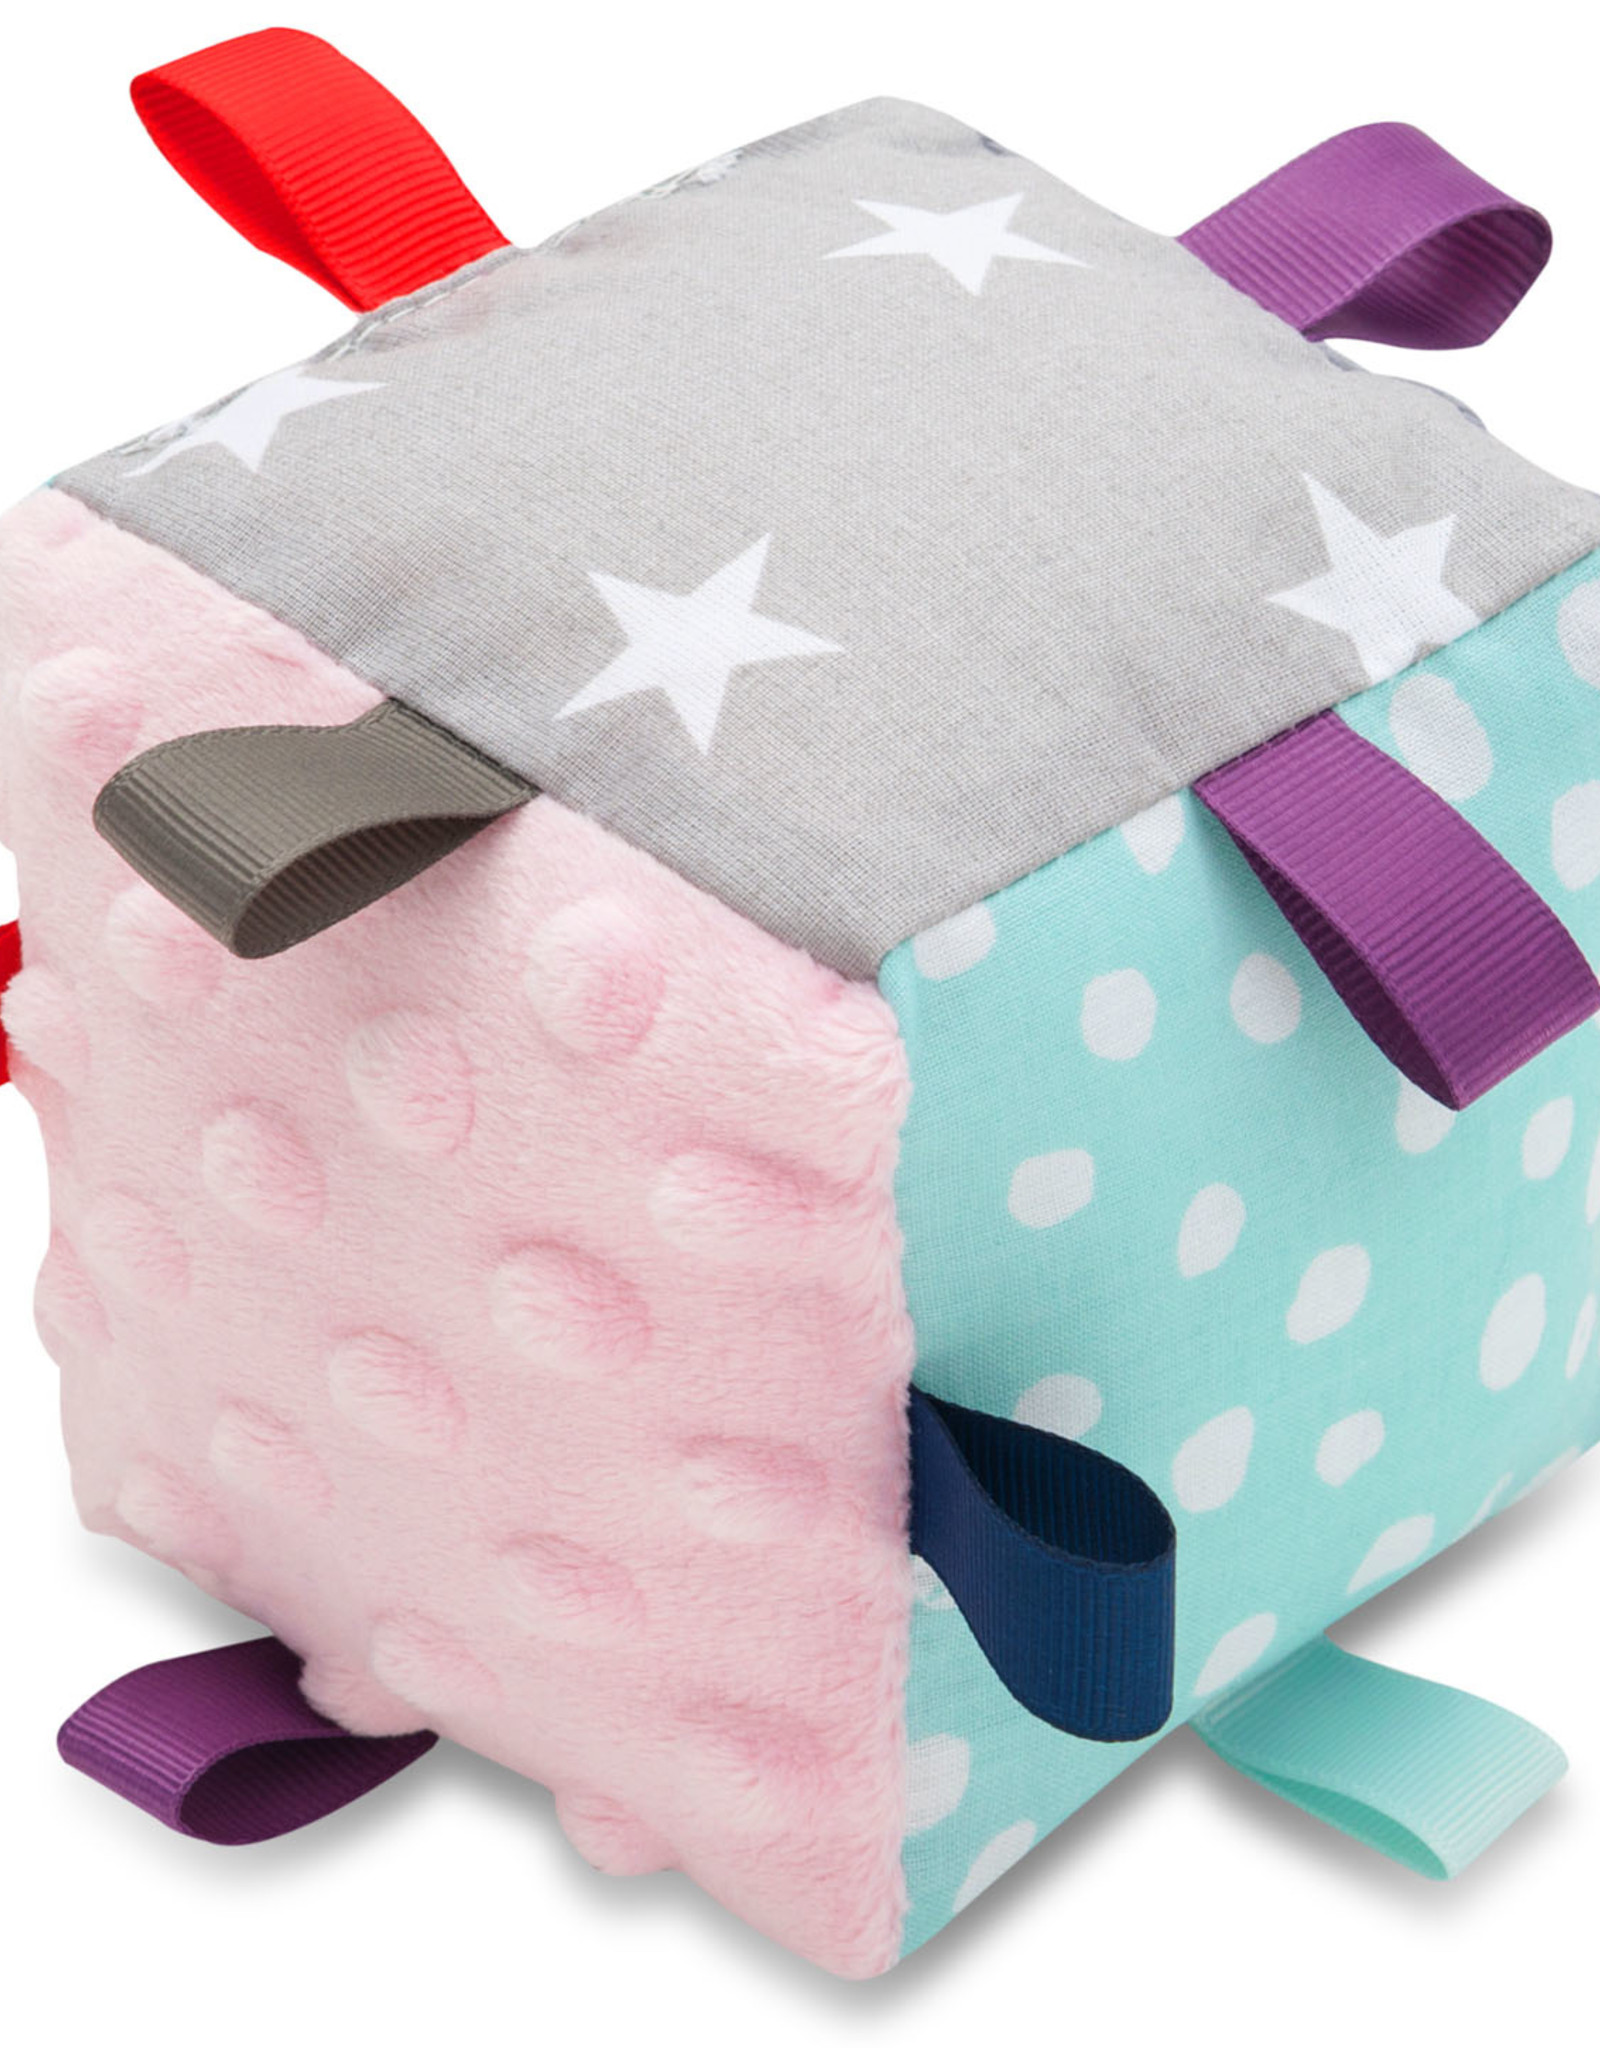 SensoCube - Roze en grijs